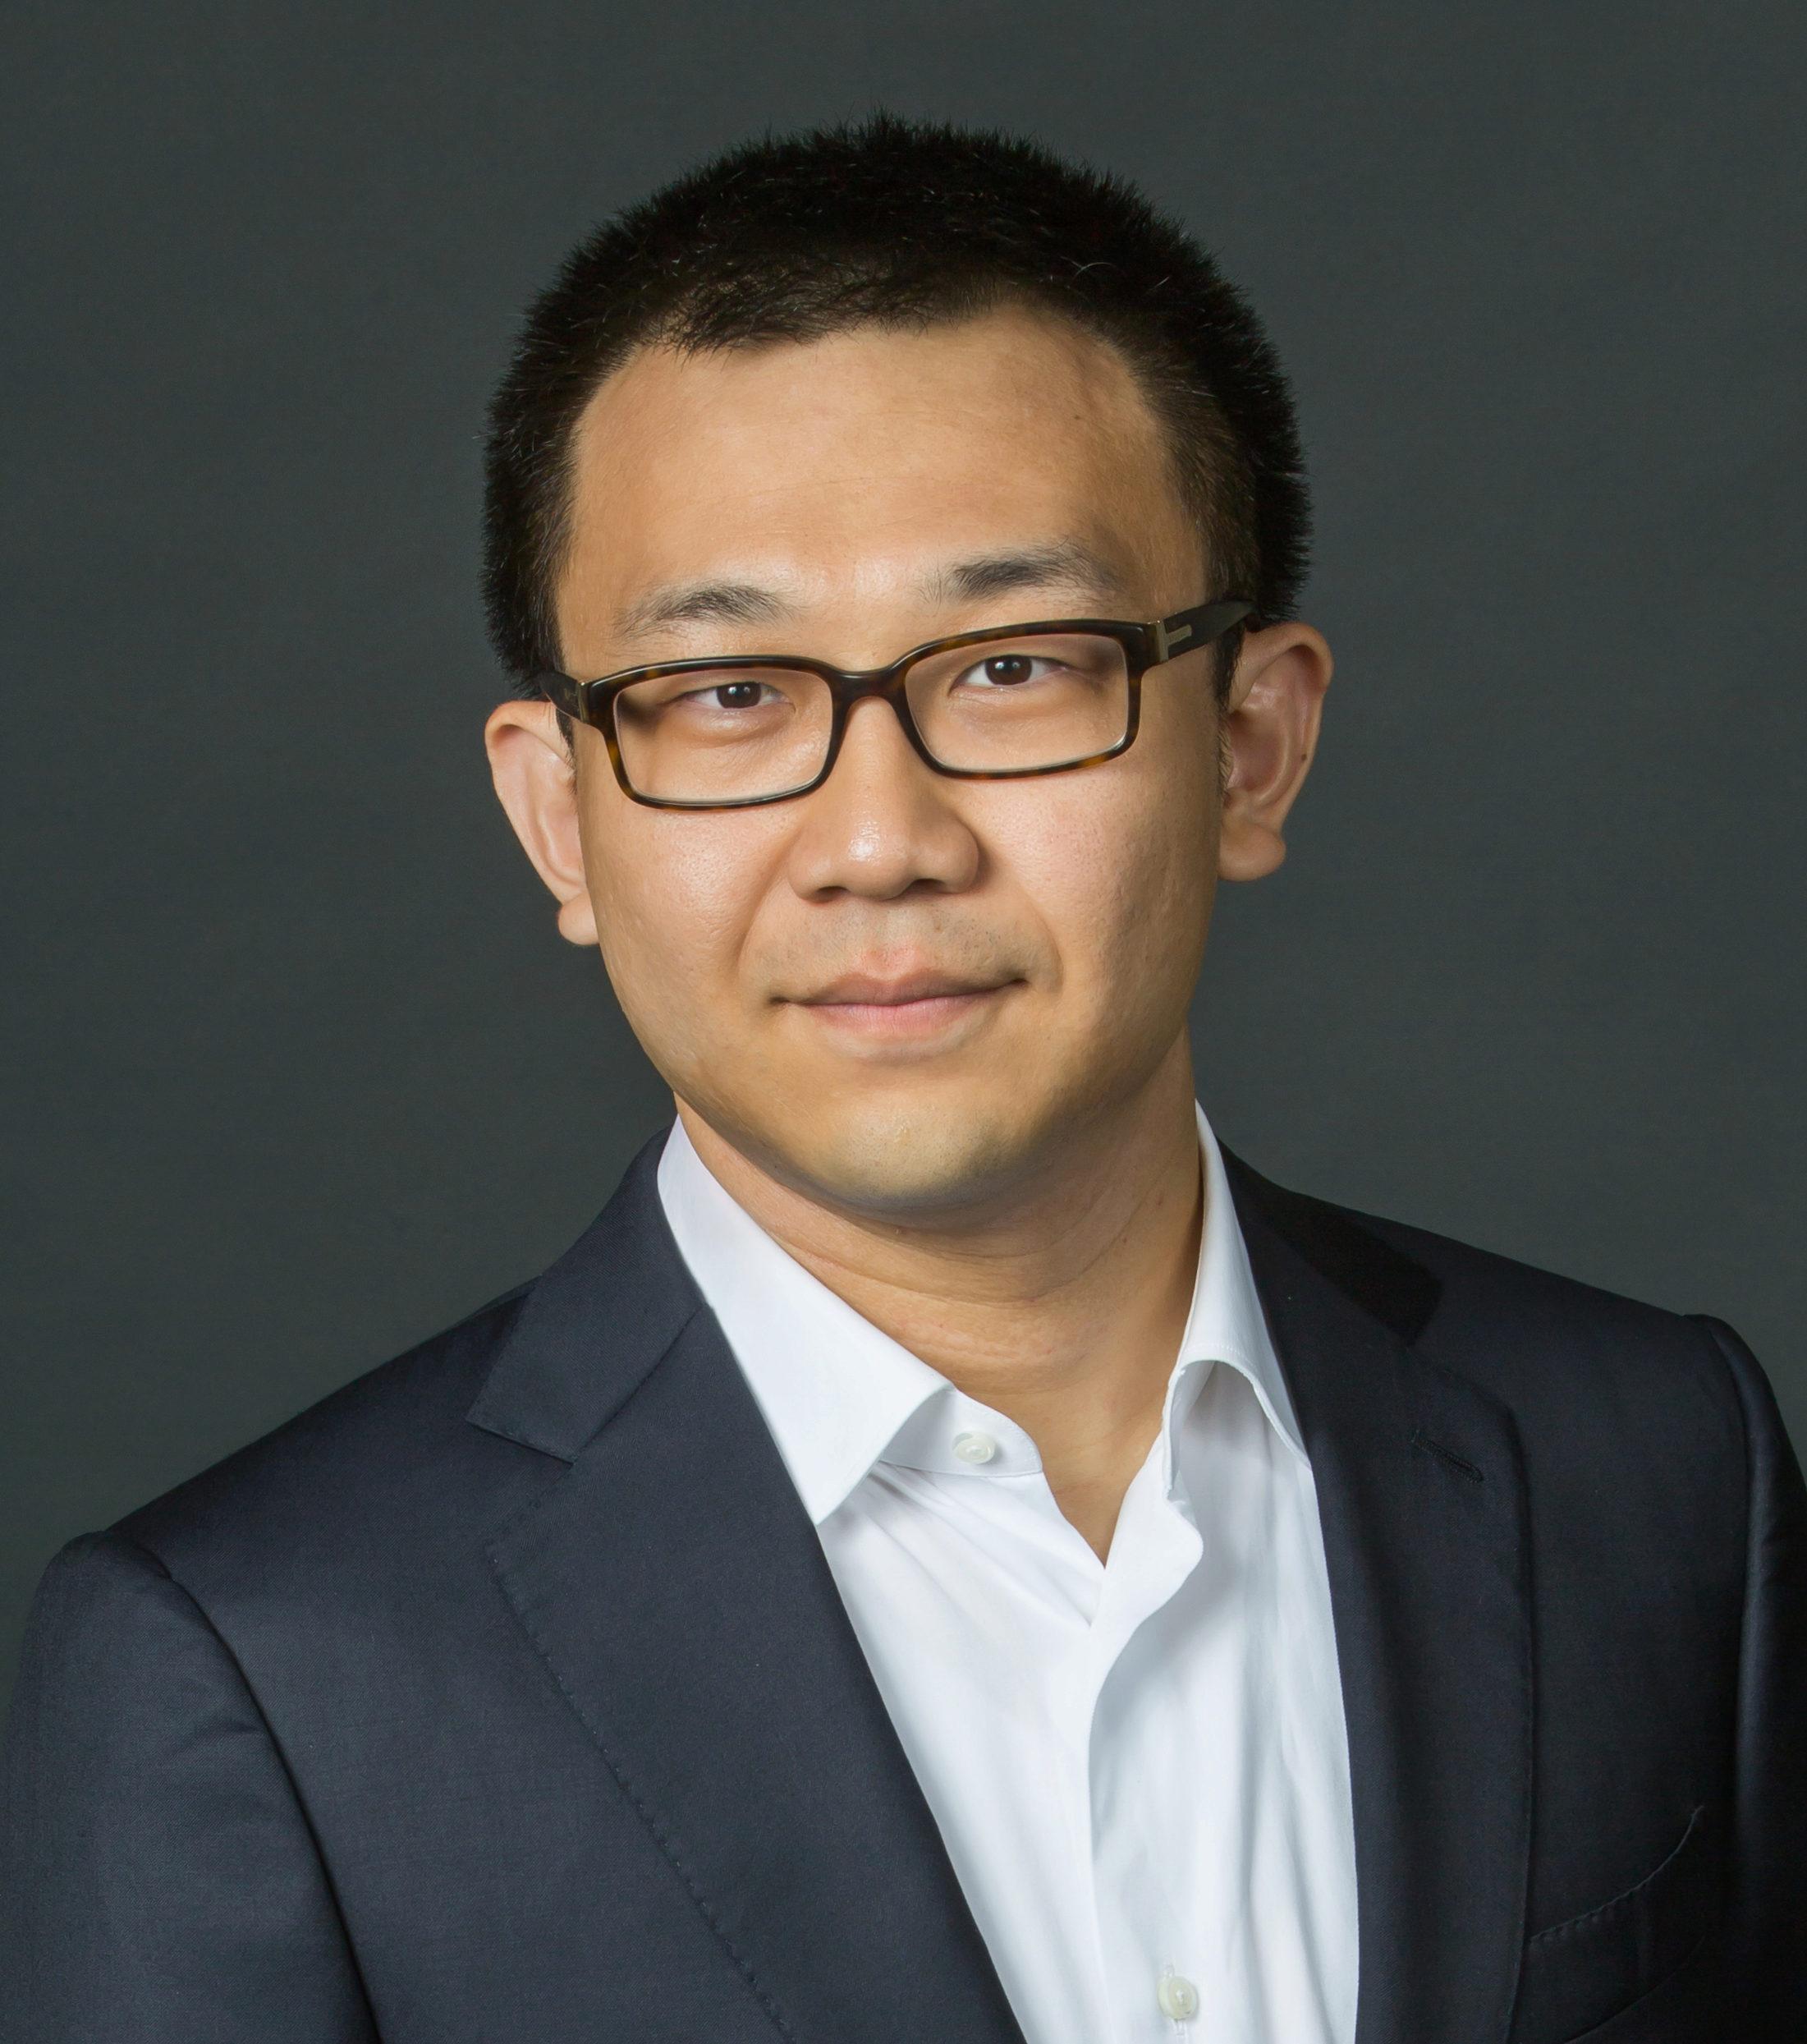 Winston Wei Dou